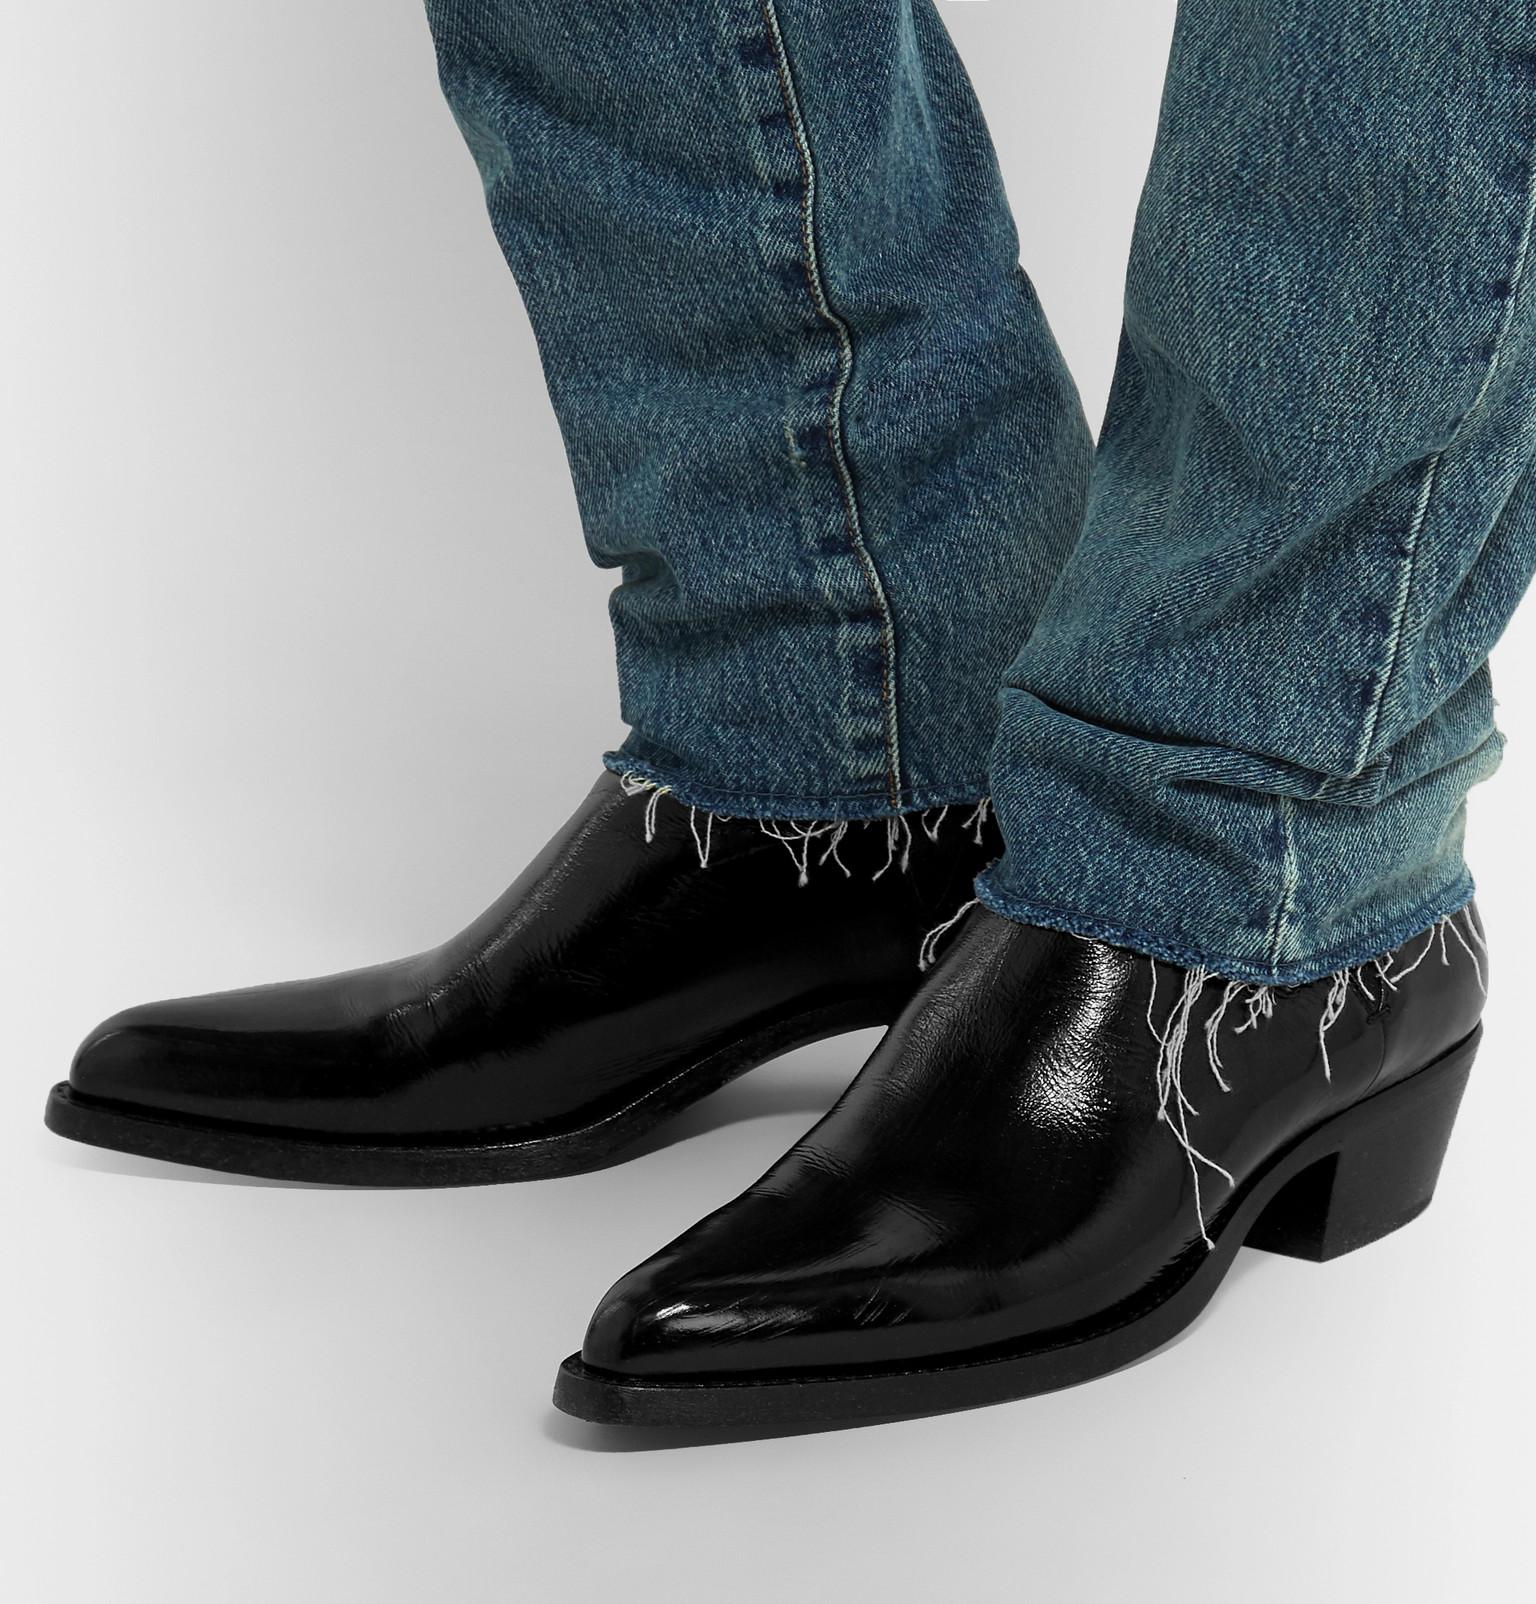 d7ad81cae1ba Saint Laurent - Dakota Polished-Leather Chelsea Boots